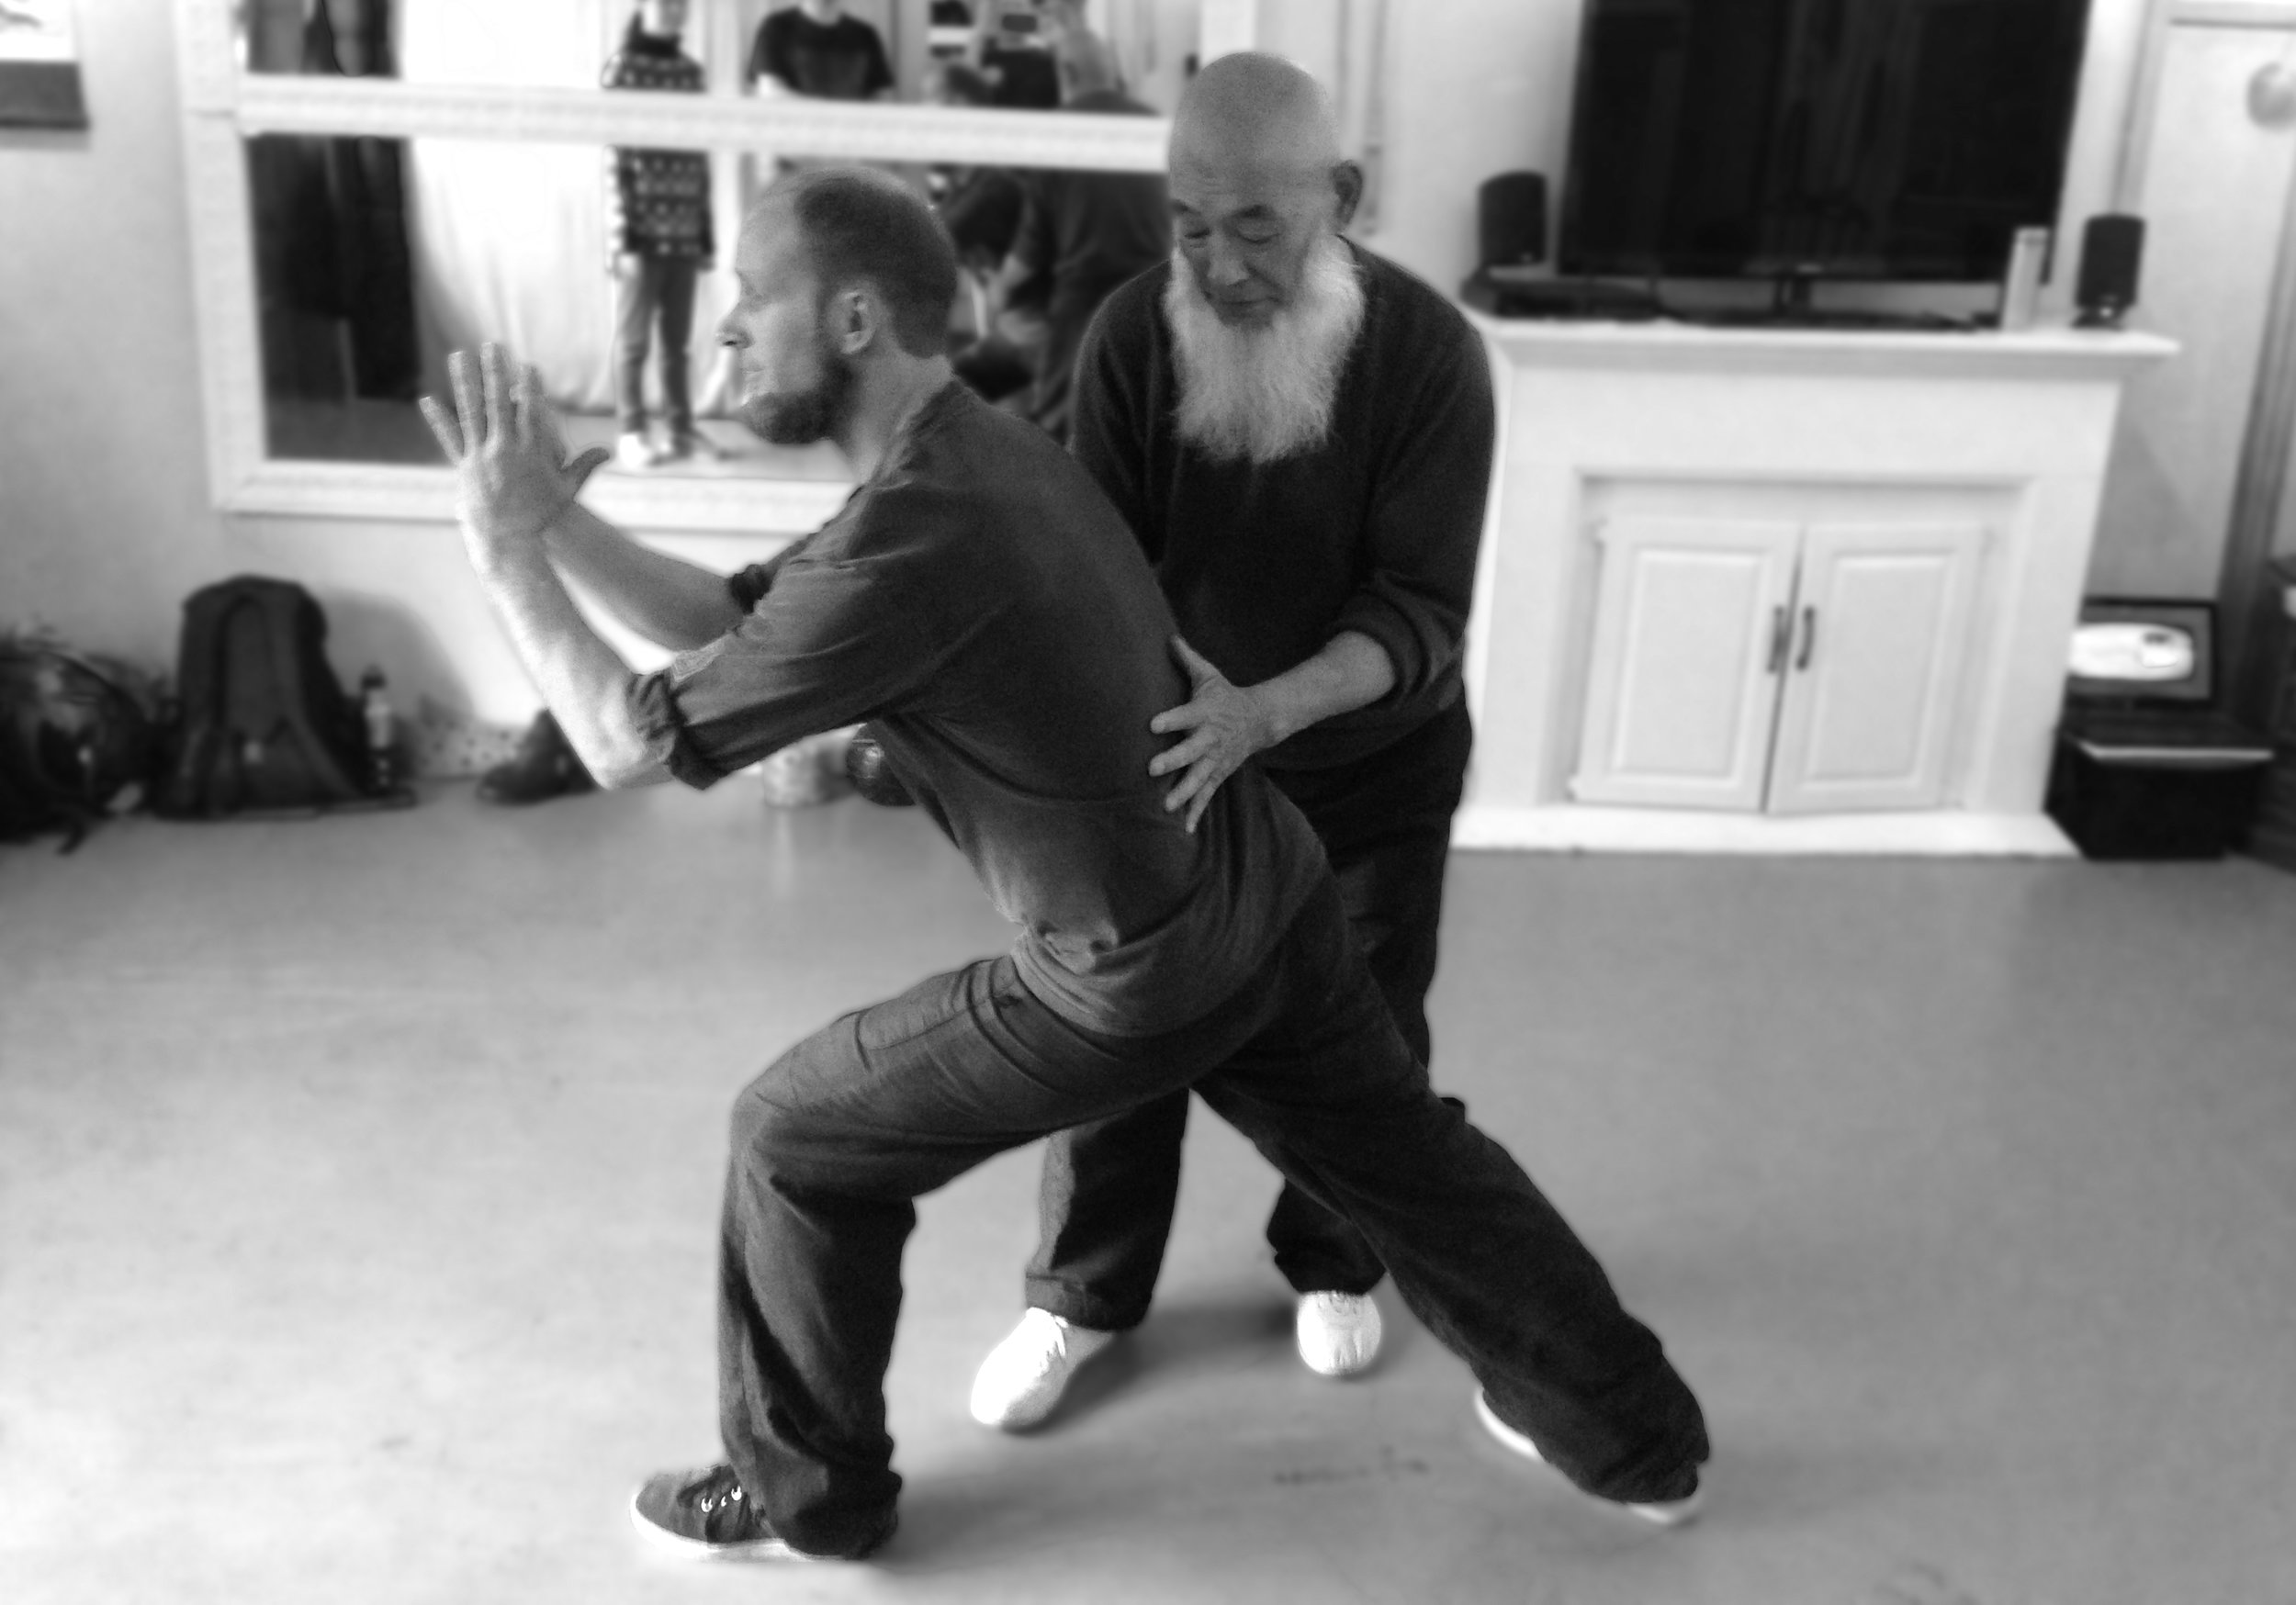 Squamish 2016 - Master Yang leading a workshop